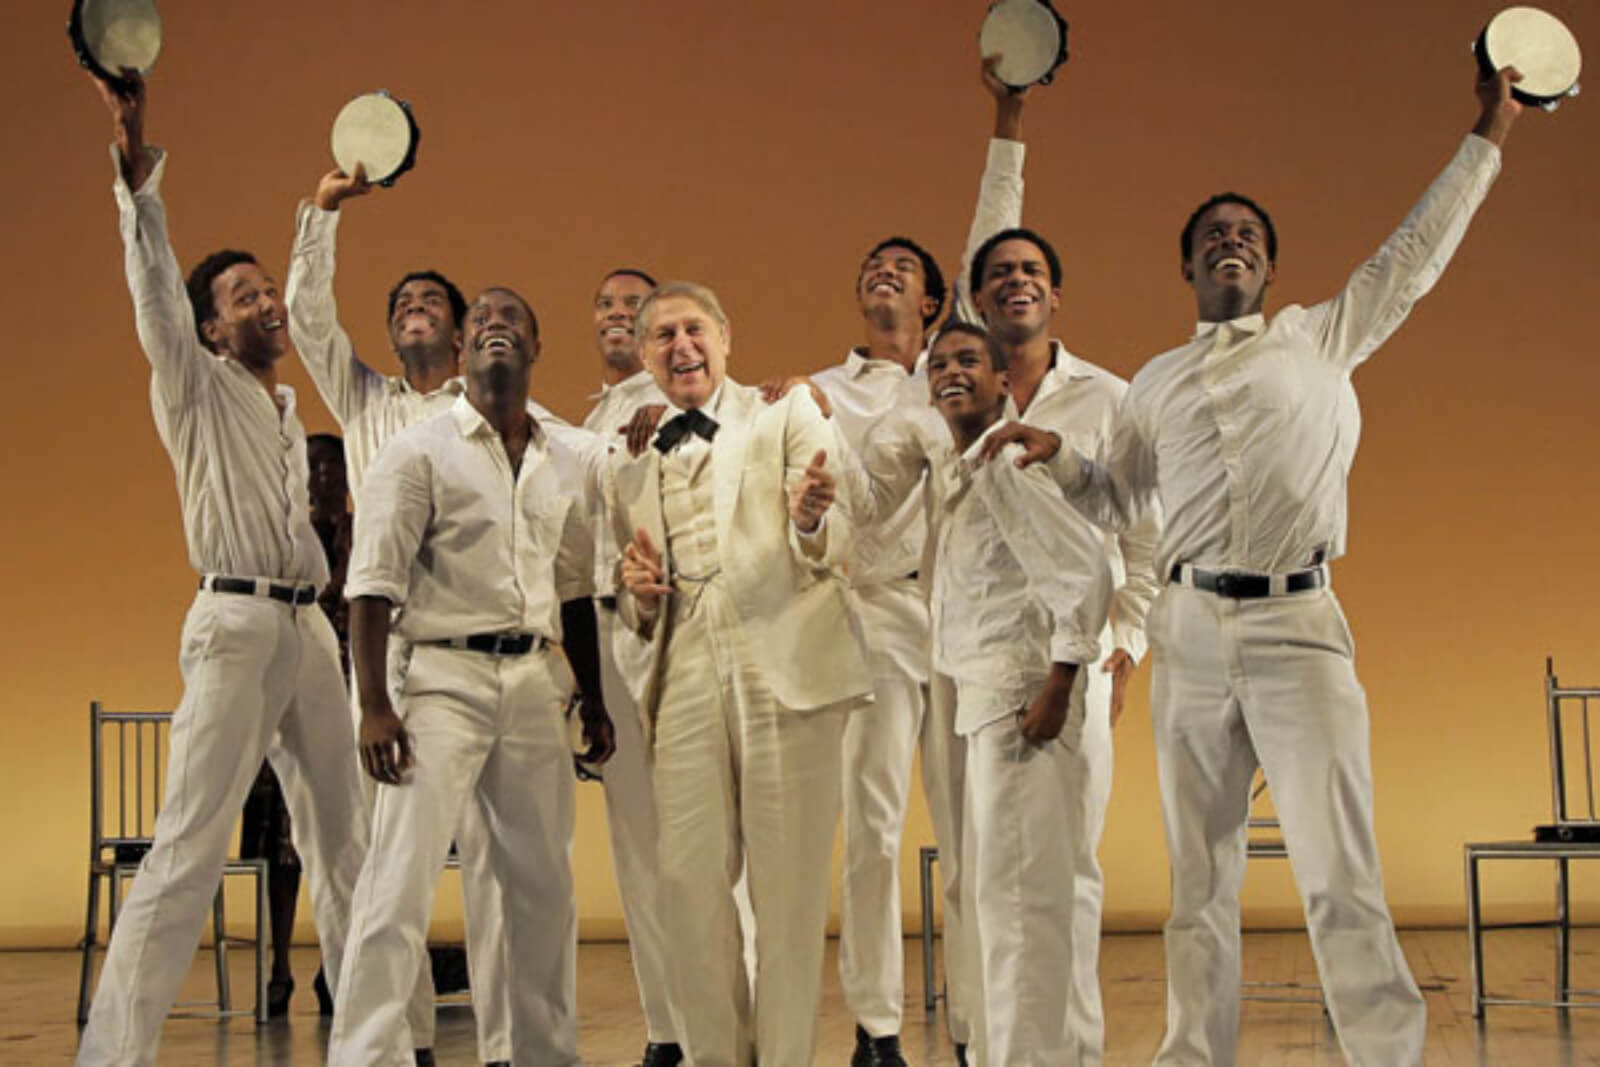 "Kendrick Jones, Julias Thomas III, James T. Lane, Rodney Hicks, John Cullum, Christian Dante White, Jeremy Gumbs, Derrick Cobey, and Josh Breckenridge are joyously singing ""Shout!"" They are all dressed in white."